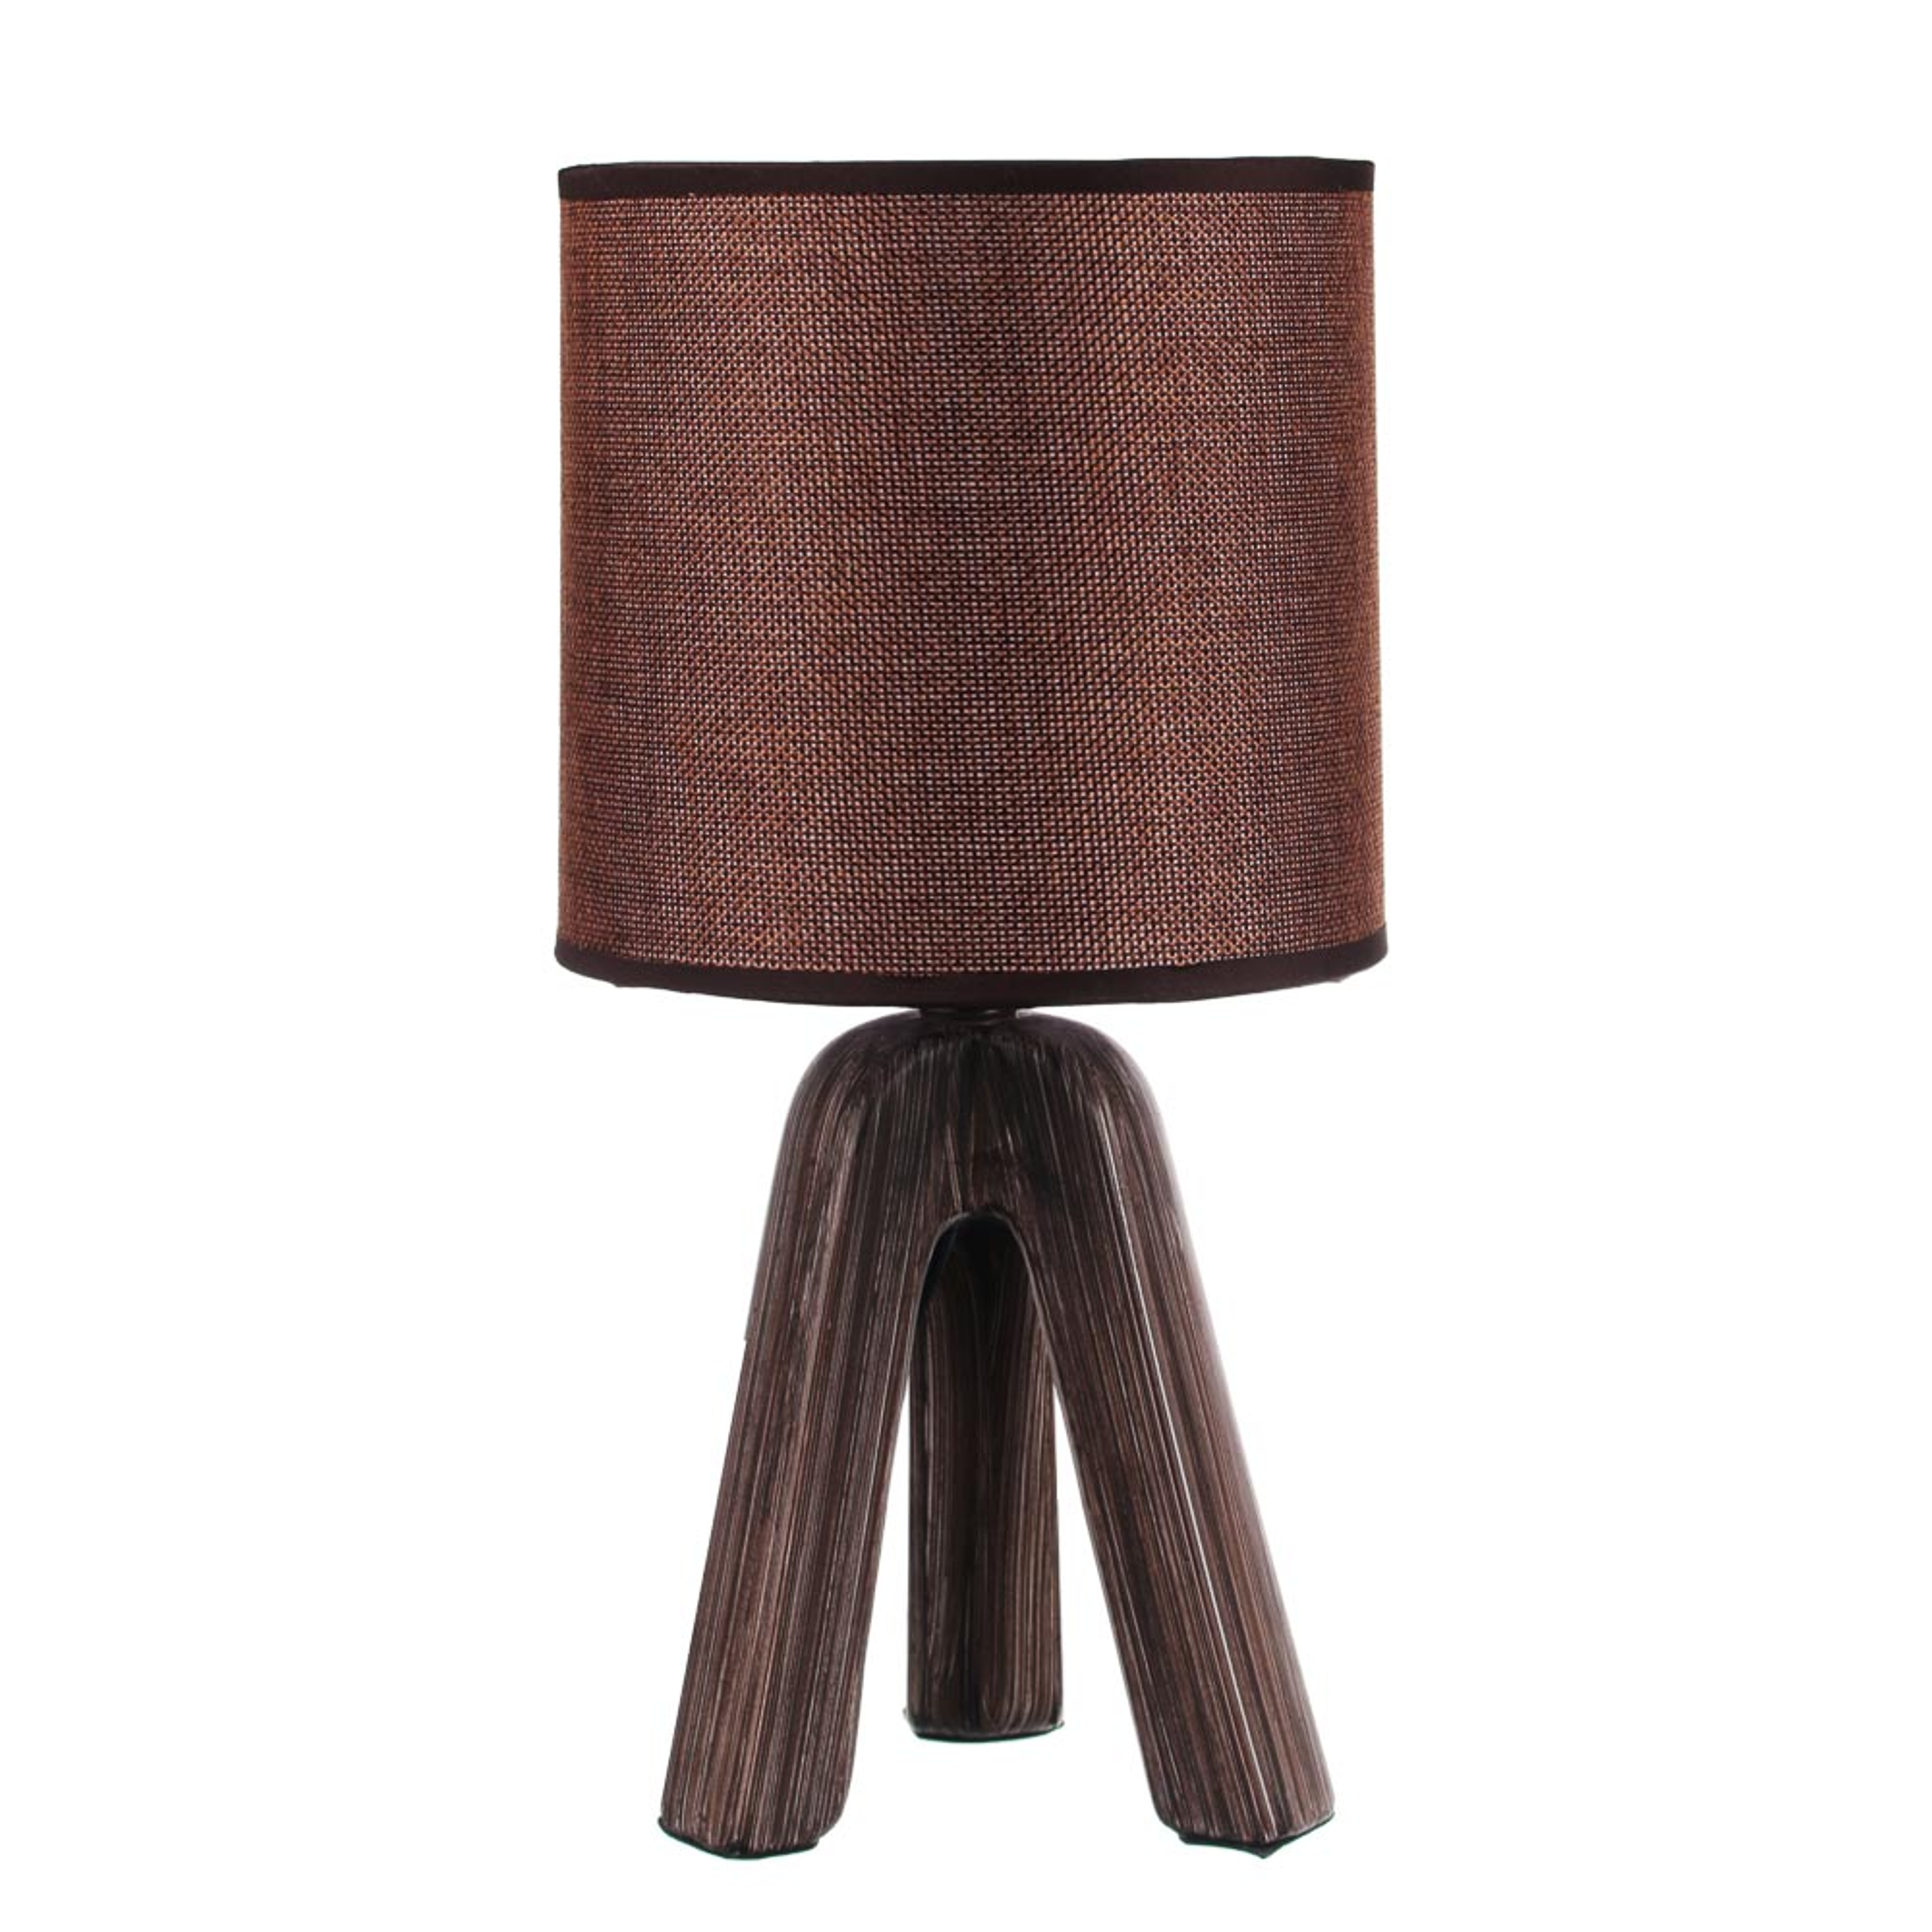 "FORZA Лампа настольная ""Венеция"", E14, 40 Вт, 220-240В, керамика, текстиль, 3 цвета"